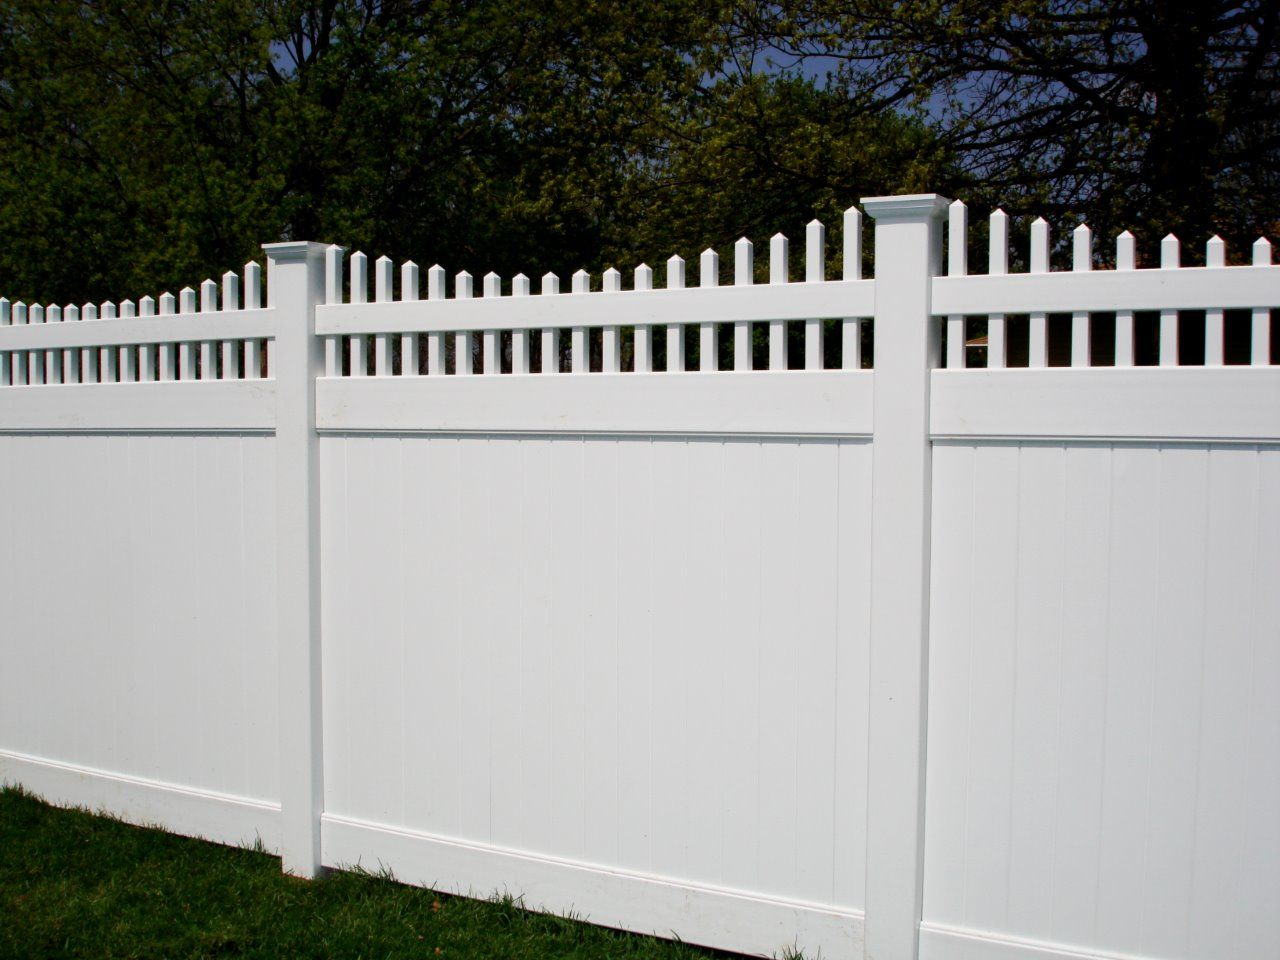 Philippines Pvc Farm Fence Posts Emblem Vinyl Fencing Vinyl Fence Fence Backyard Living